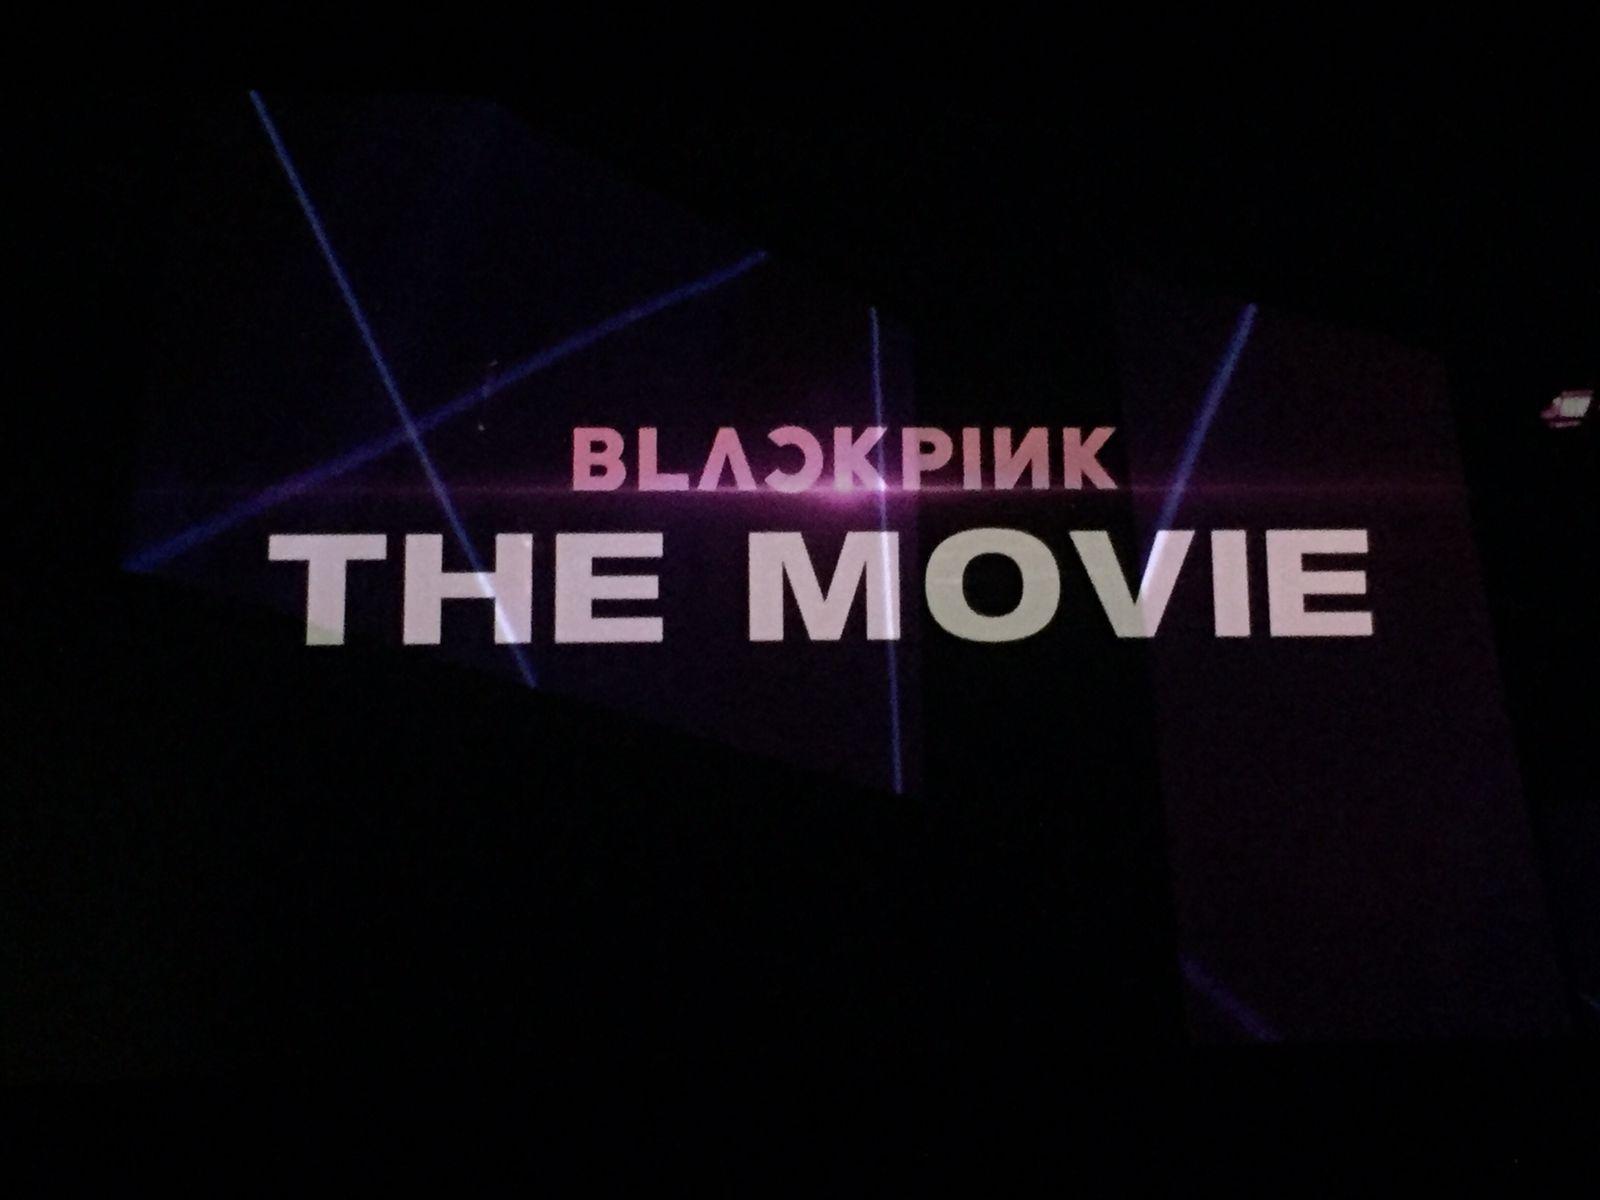 Blackpink The Movie titulo